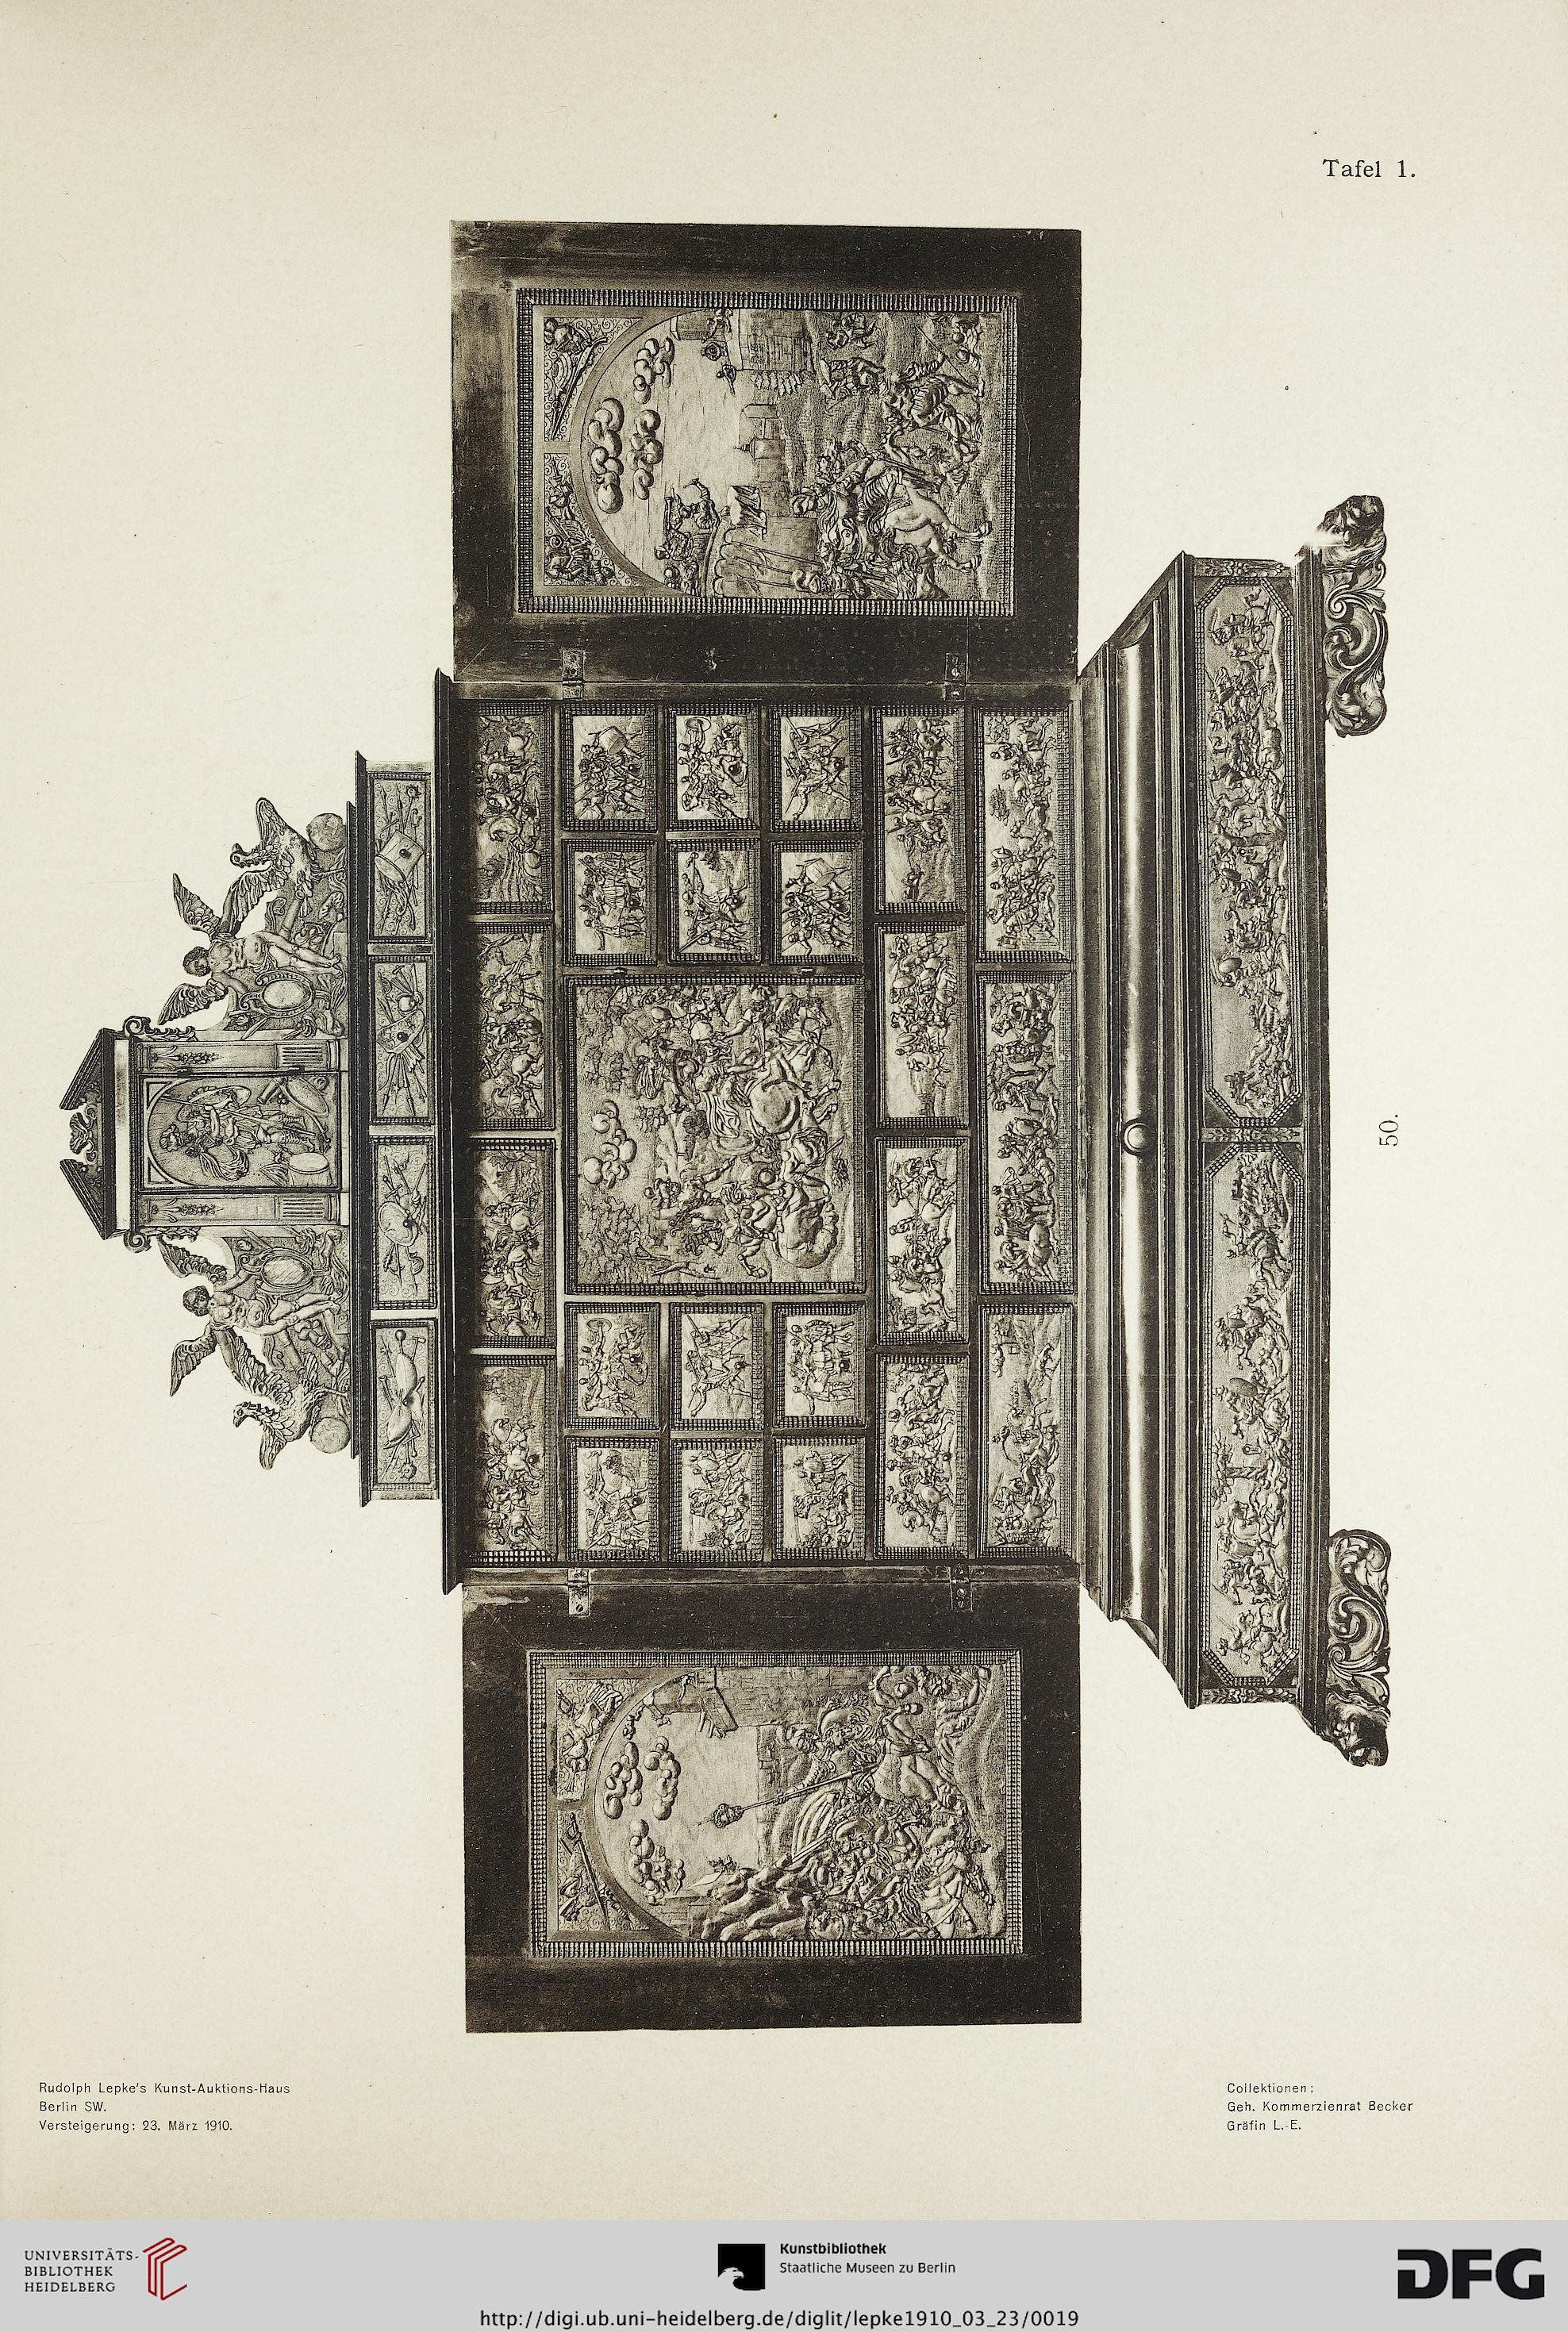 rudolph lepke 39 s kunst auctions haus hrsg. Black Bedroom Furniture Sets. Home Design Ideas